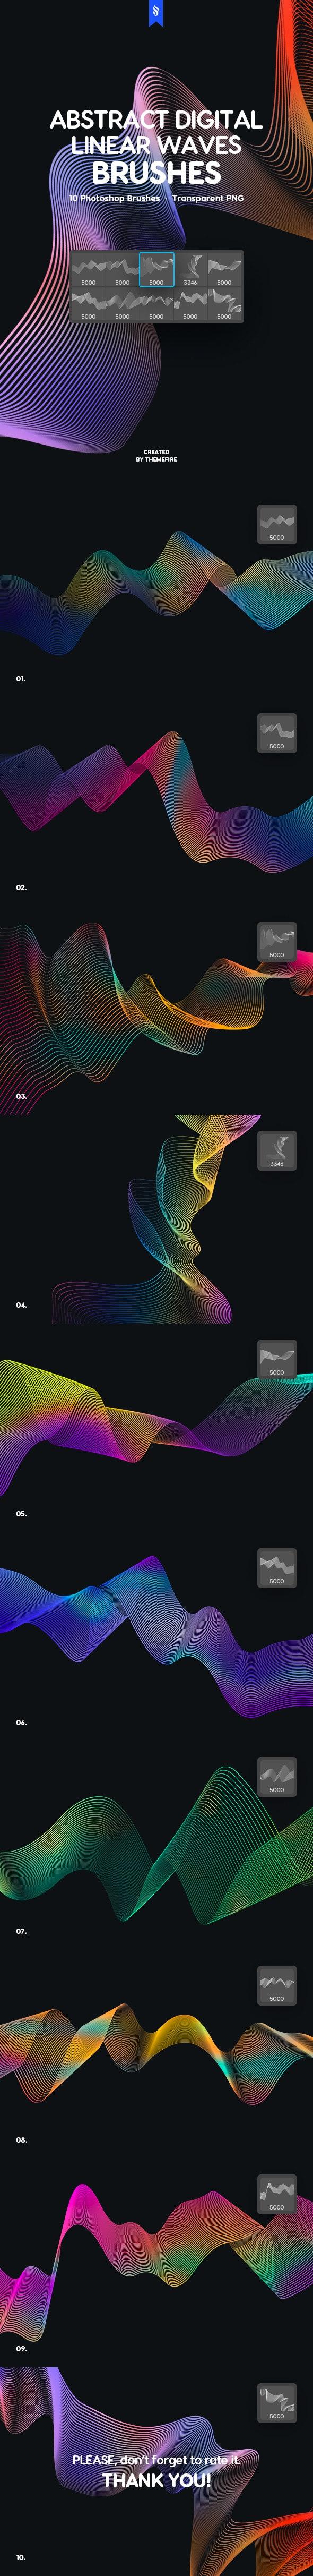 Futuristic Linear Waves Photoshop Brushes - Techno / Futuristic Brushes